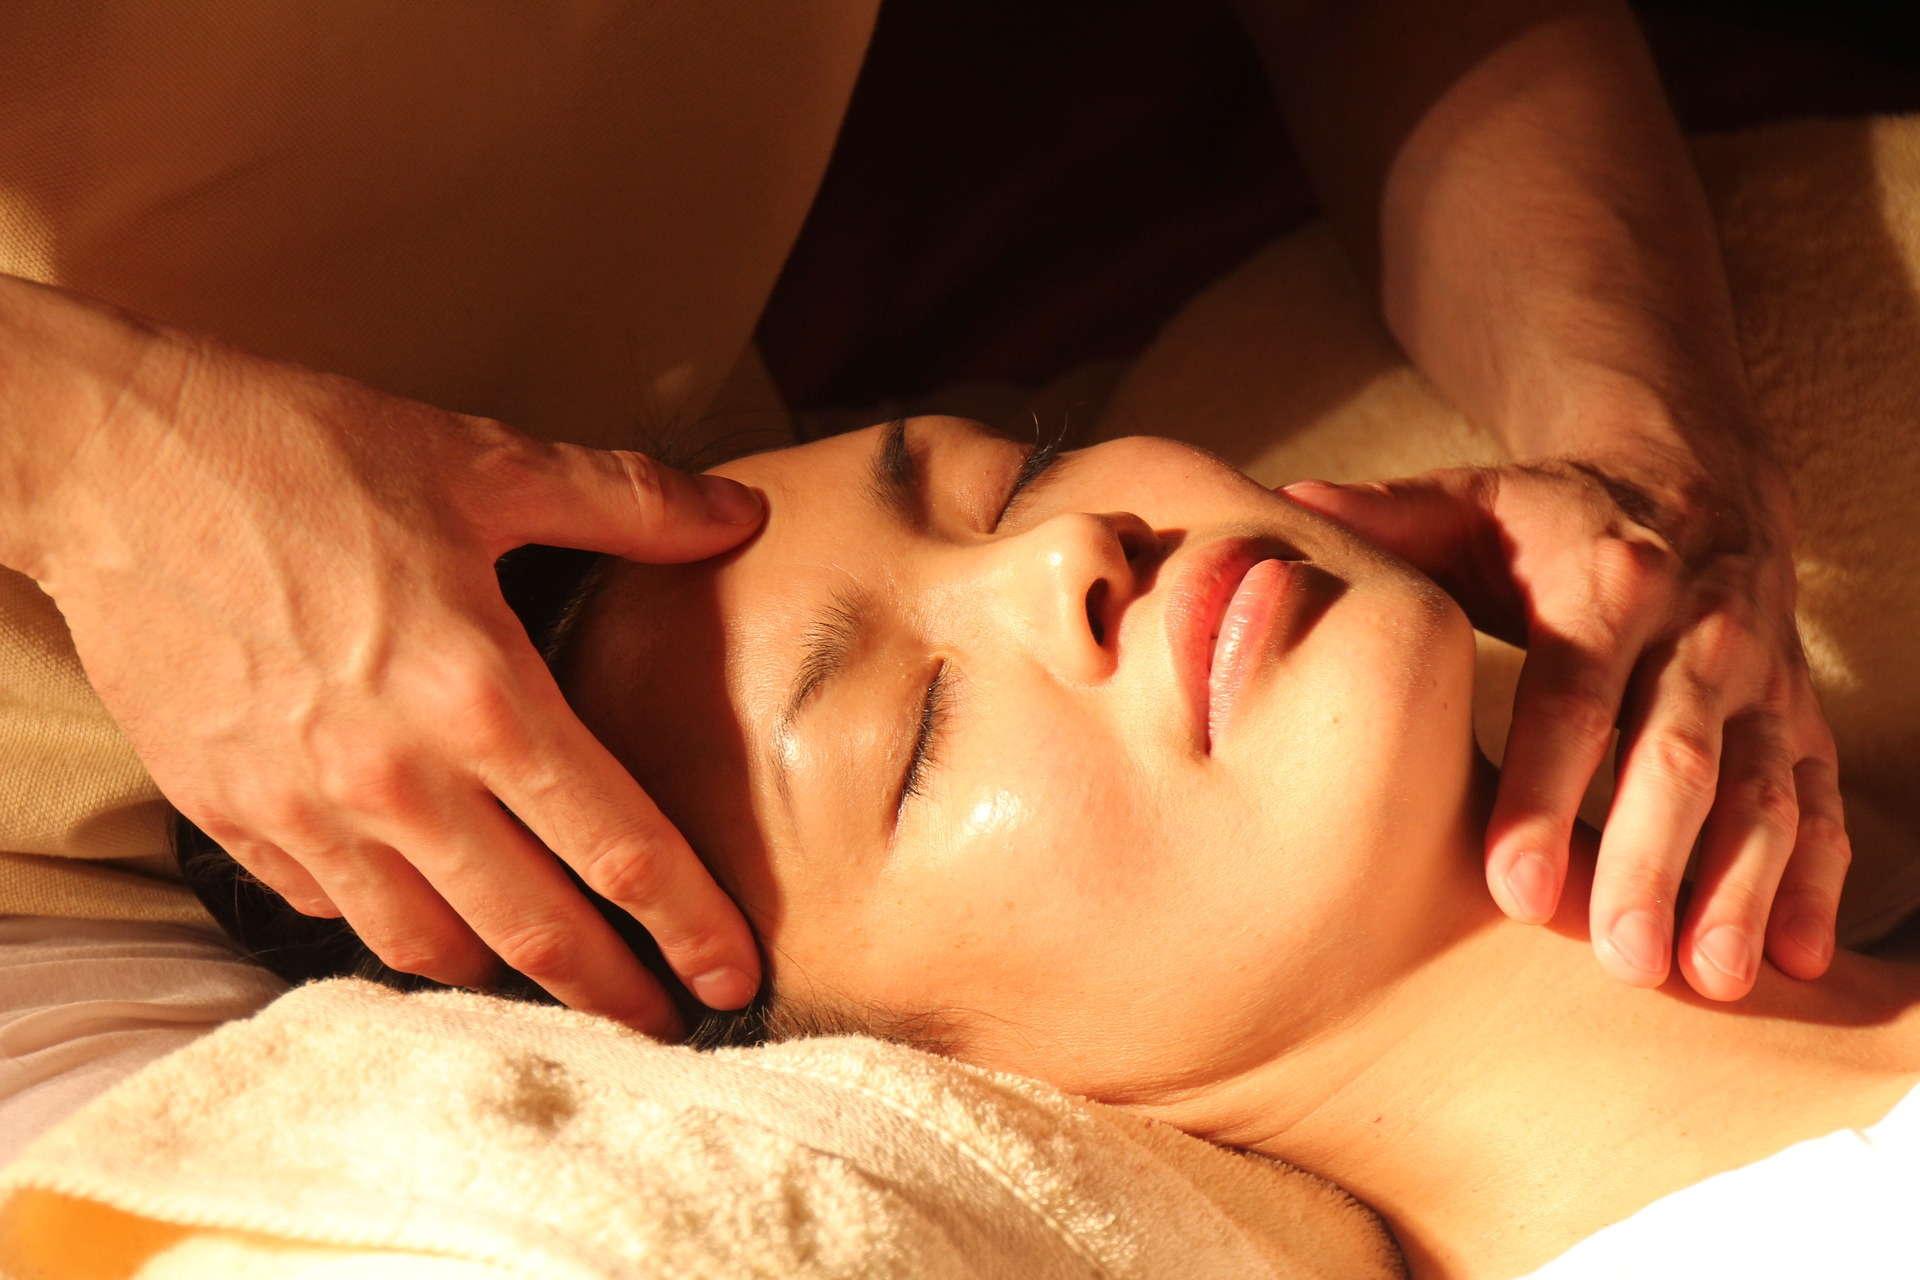 massage 1929064 1920 - Japoński sekret pięknej skóry